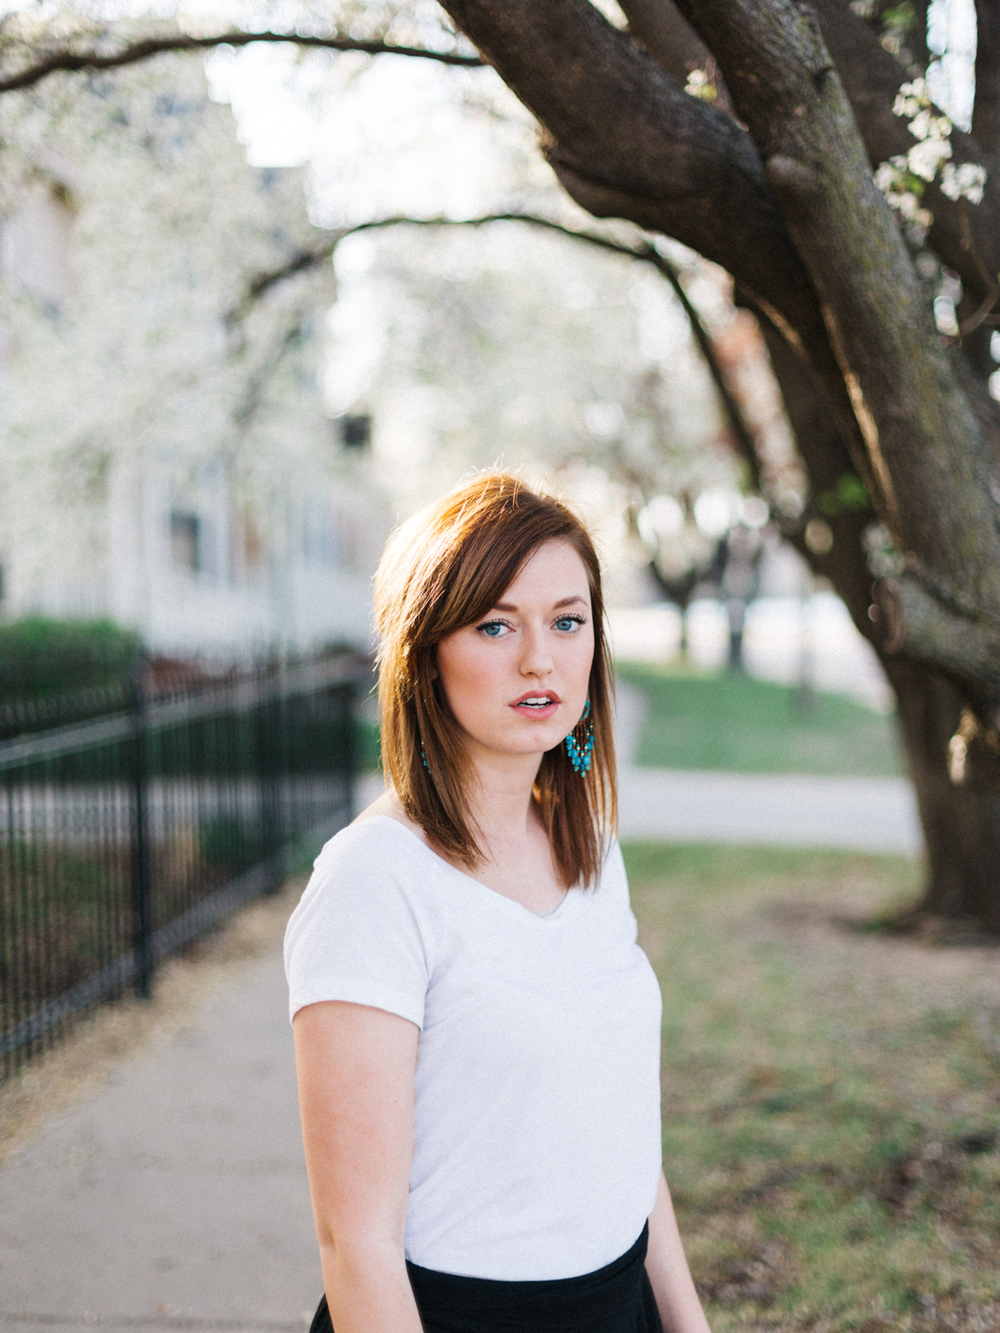 Alexis-Neal Dieker-Portrait Photographer-Wichita, KS-101.jpg